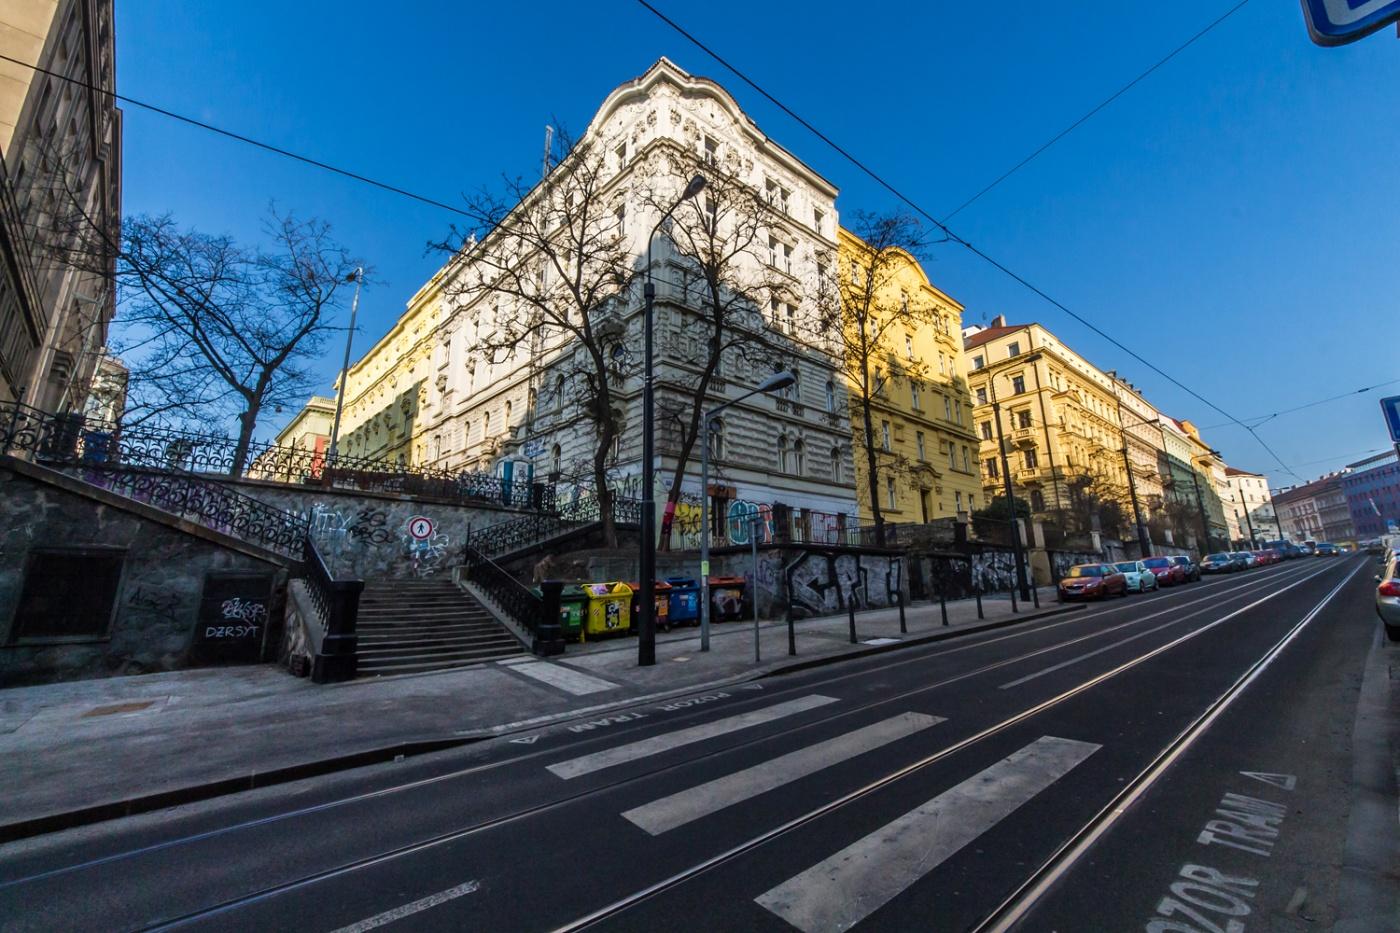 Půdní byt 3+kk, plocha 118 m², ulice Wenzigova, Praha 2 - Vinohrady | 7